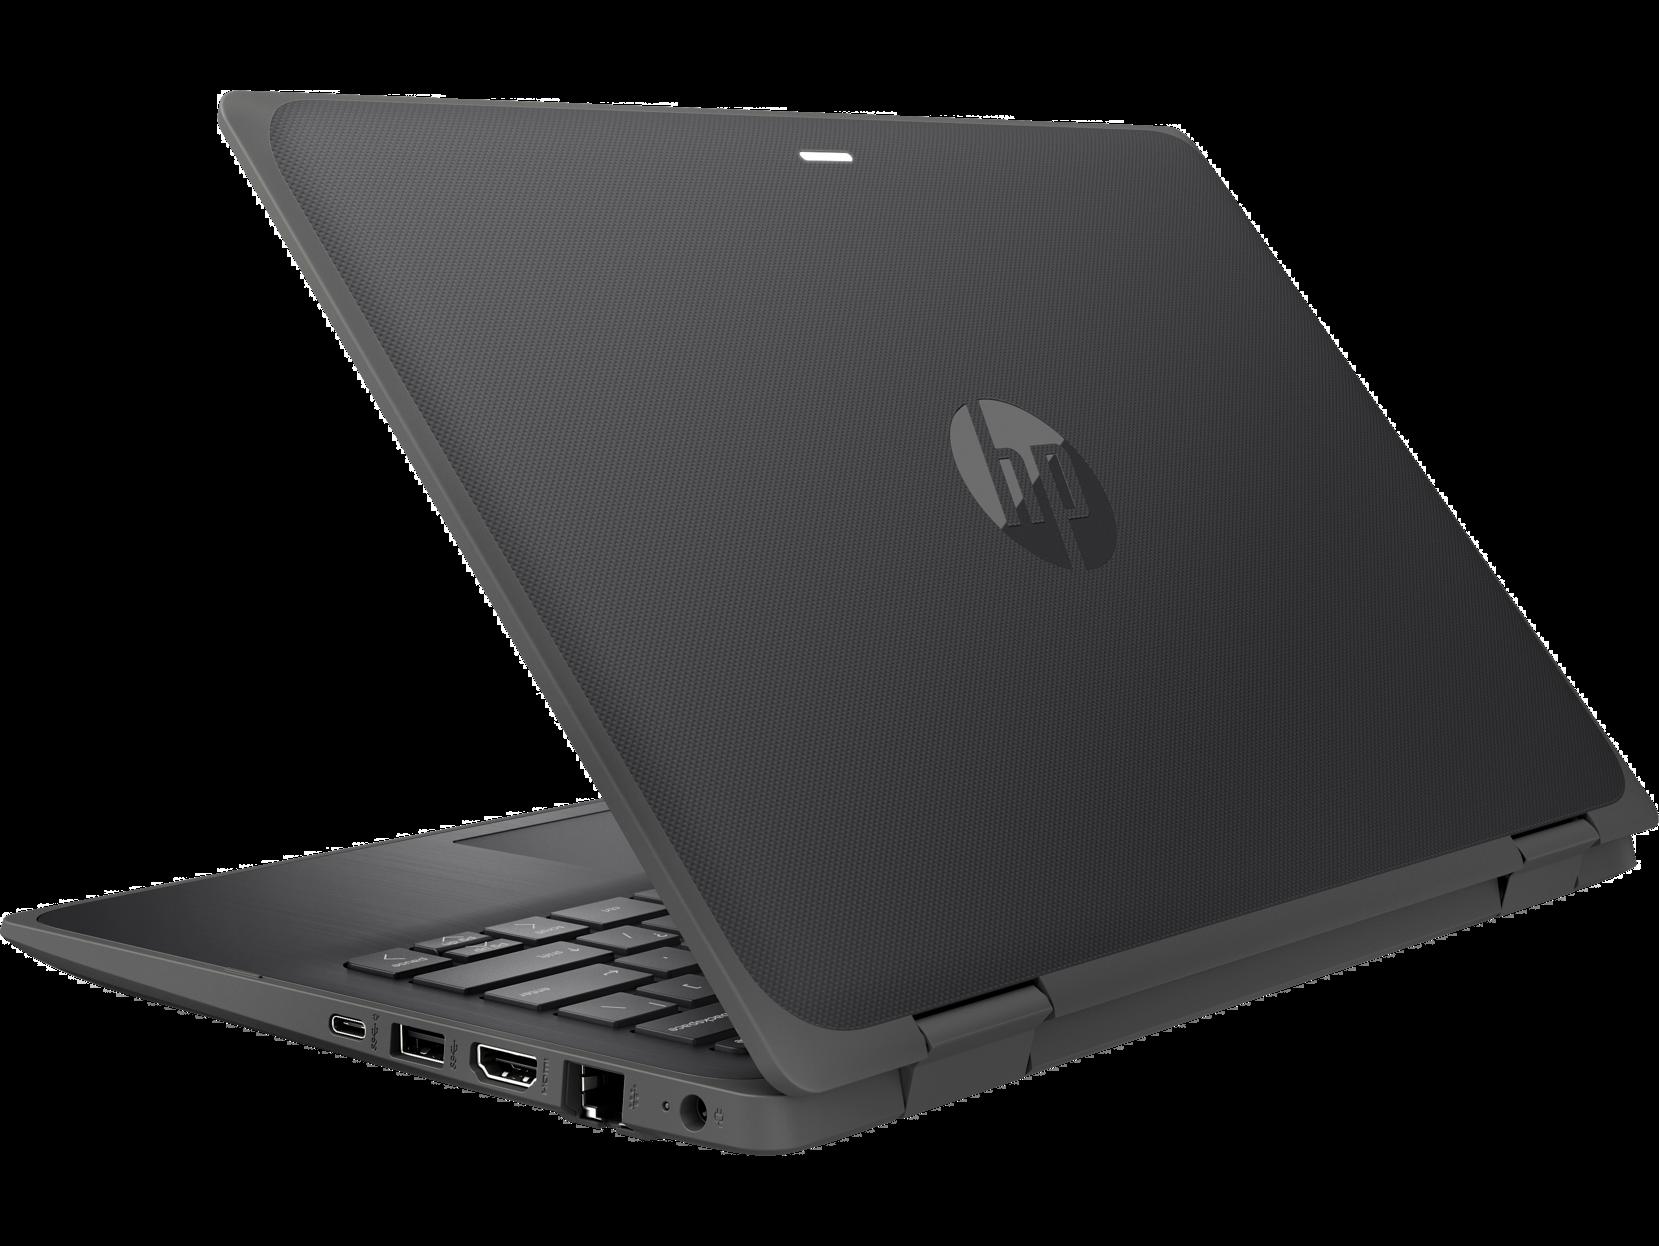 Abbildung HP x360 11 G5